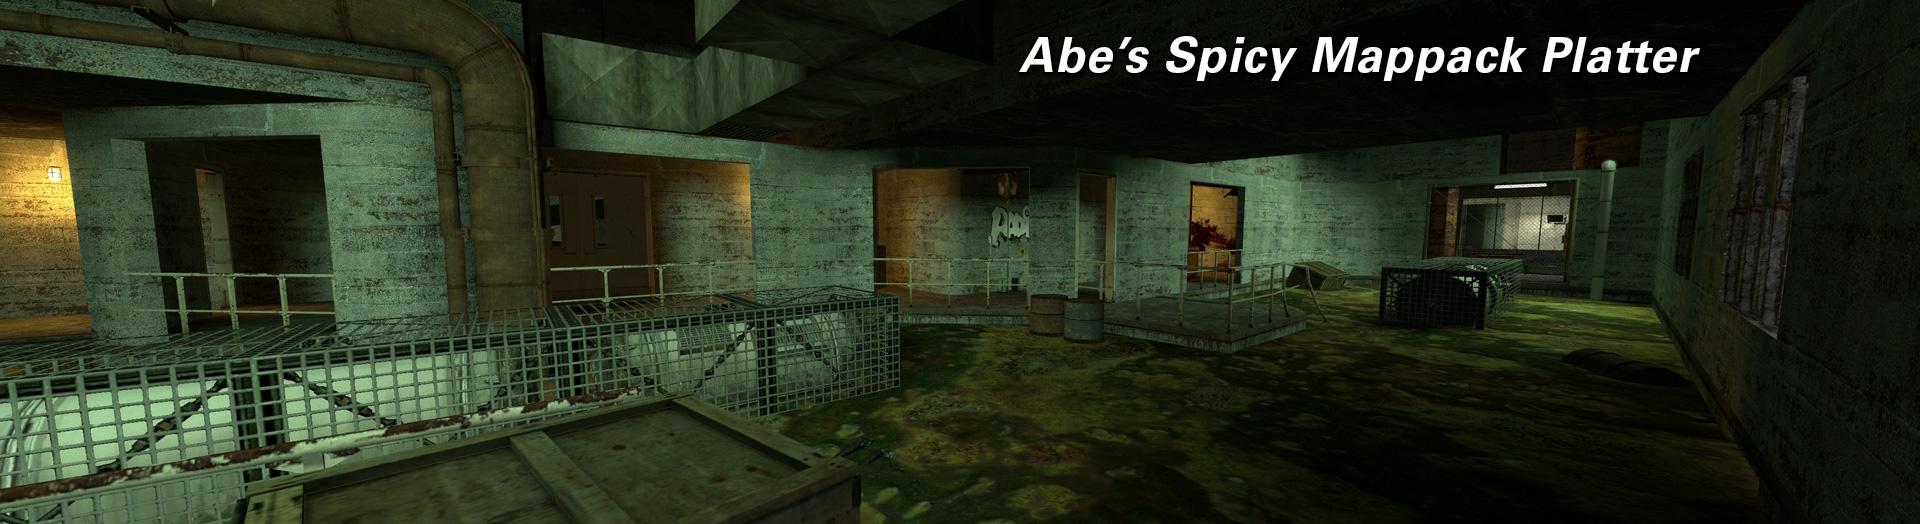 Abe's Spicy Mappack